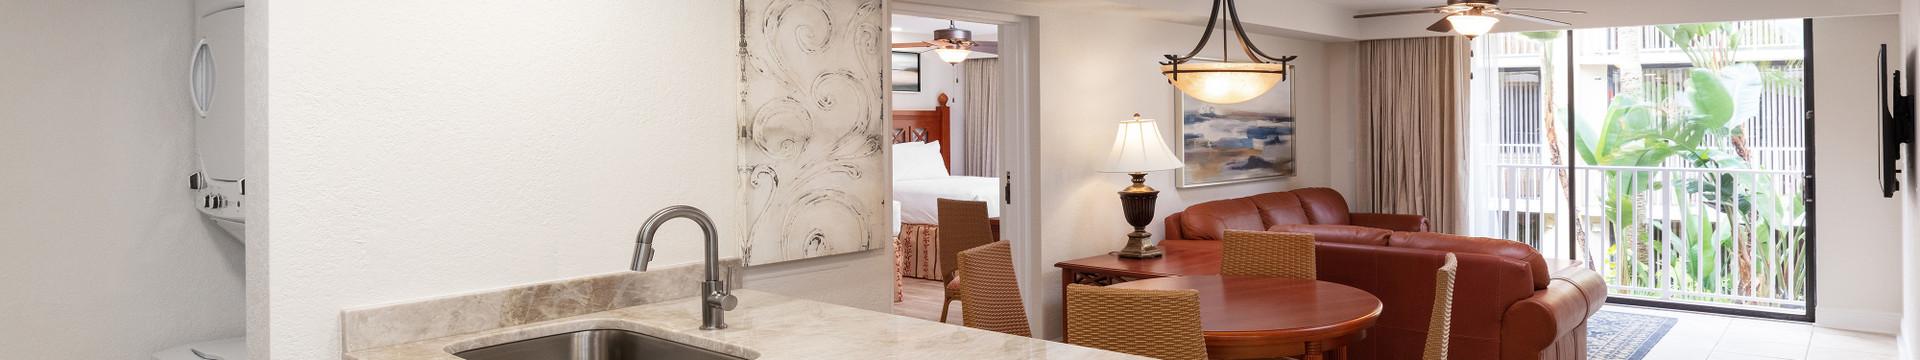 Two-Bedroom Villa at our hotel villas in Orlando Florida   Westgate Towers Resort   Westgate Resorts